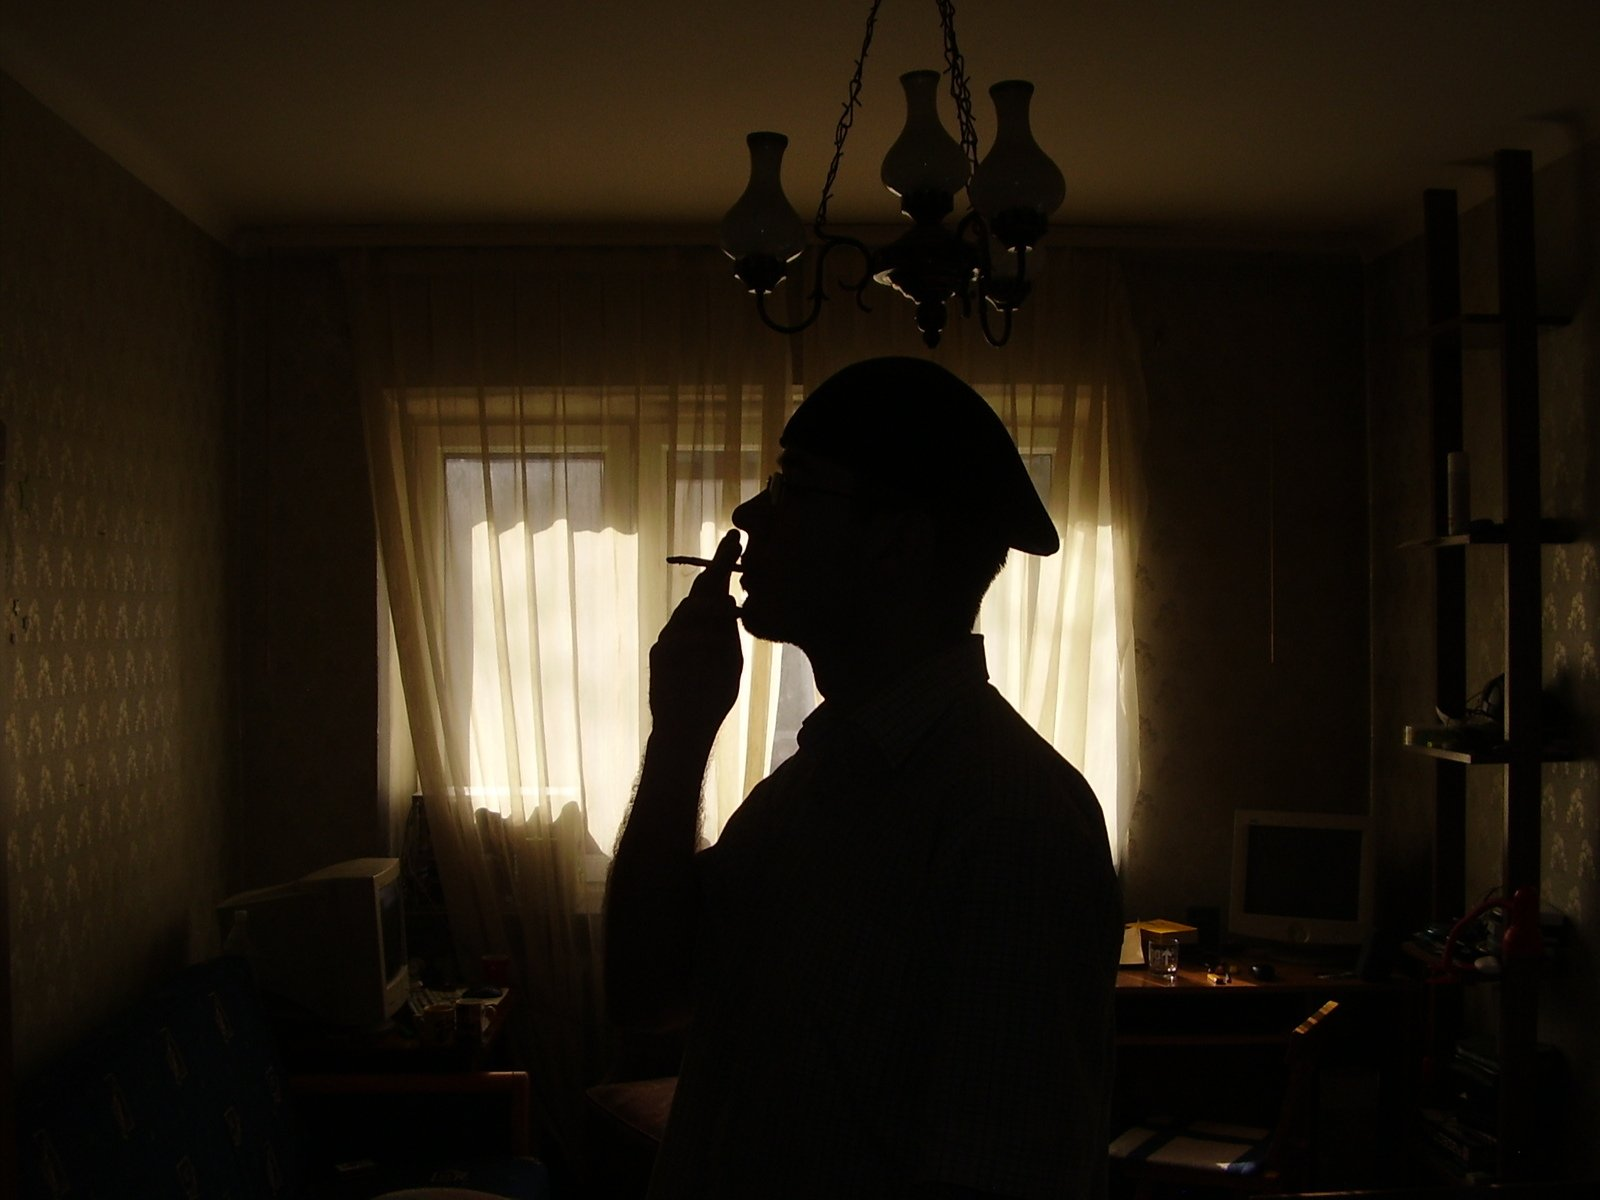 muž s cigaretou